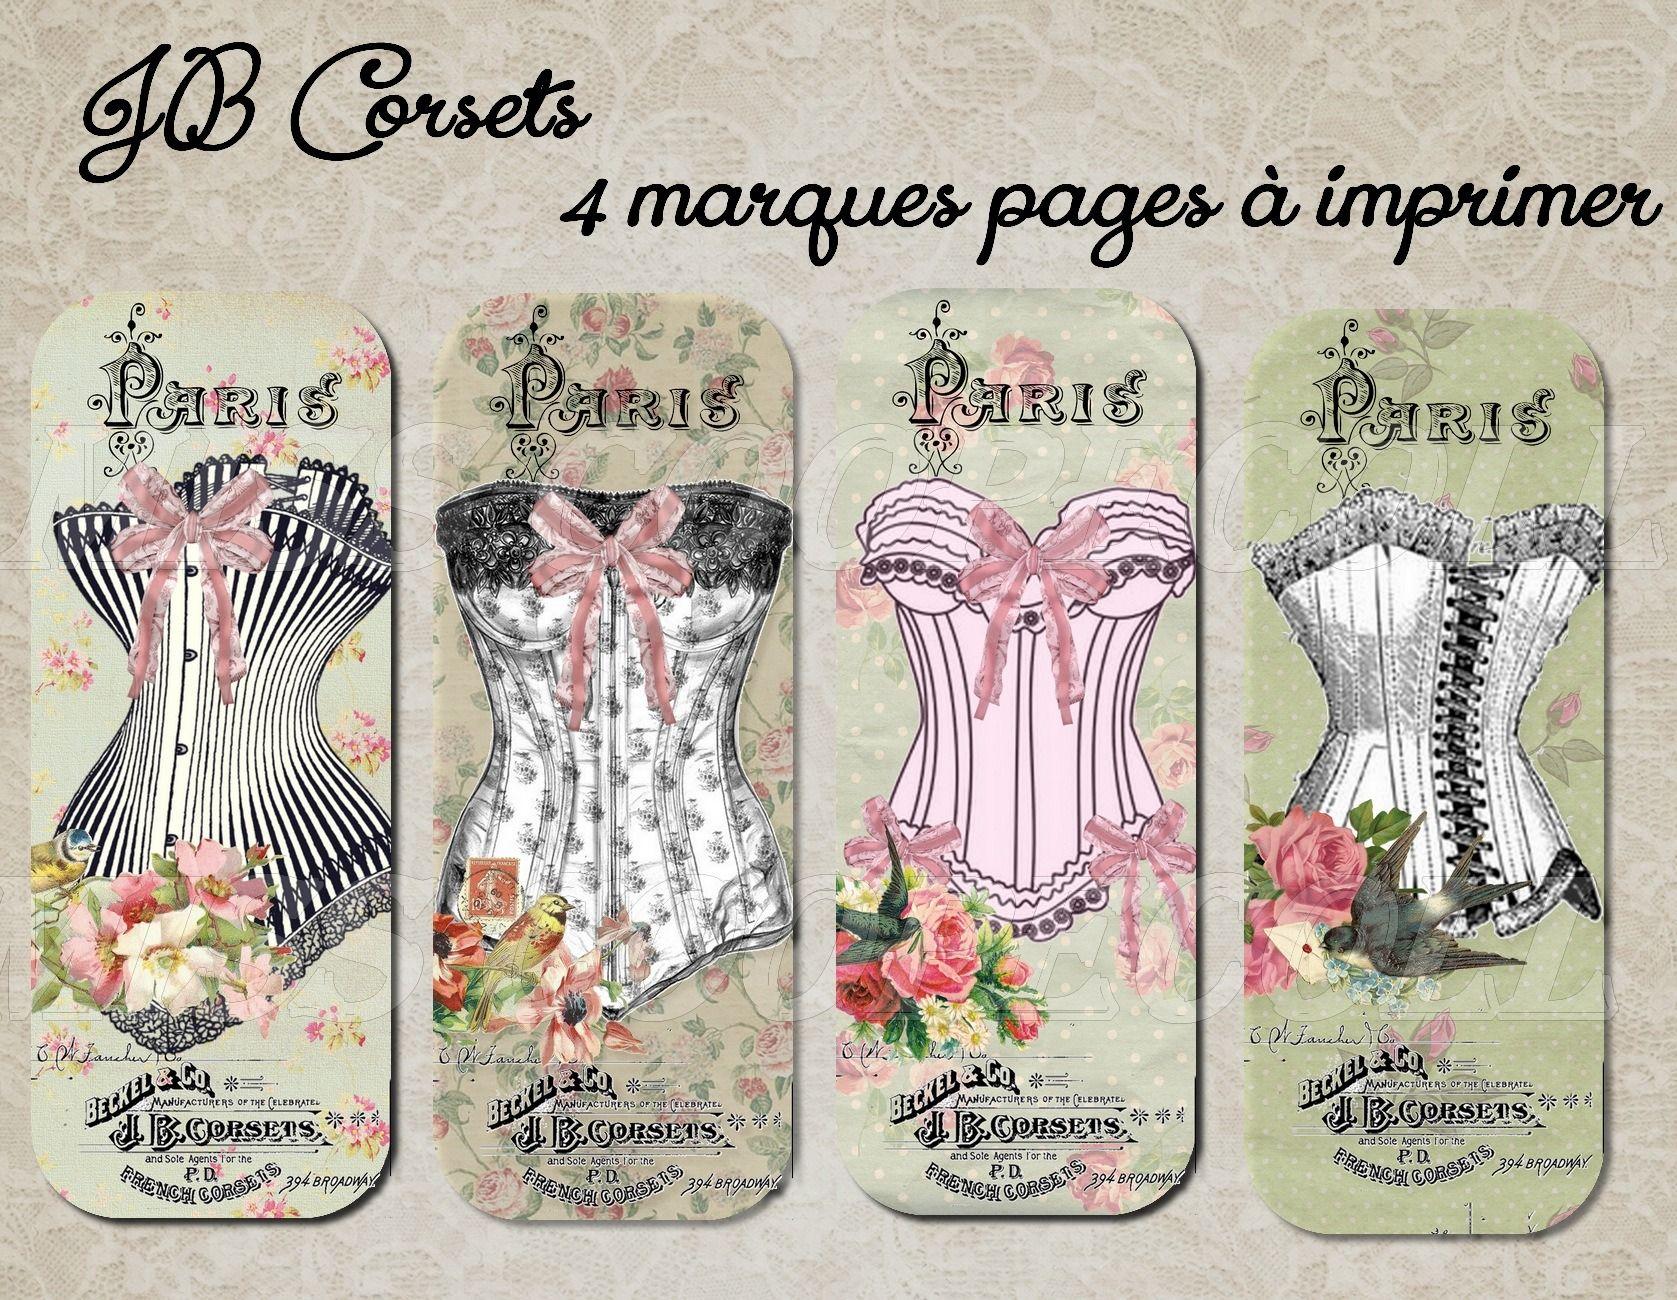 4 marques pages imprimer jb corsets marque pages par miss coopecoll corsets pinterest. Black Bedroom Furniture Sets. Home Design Ideas